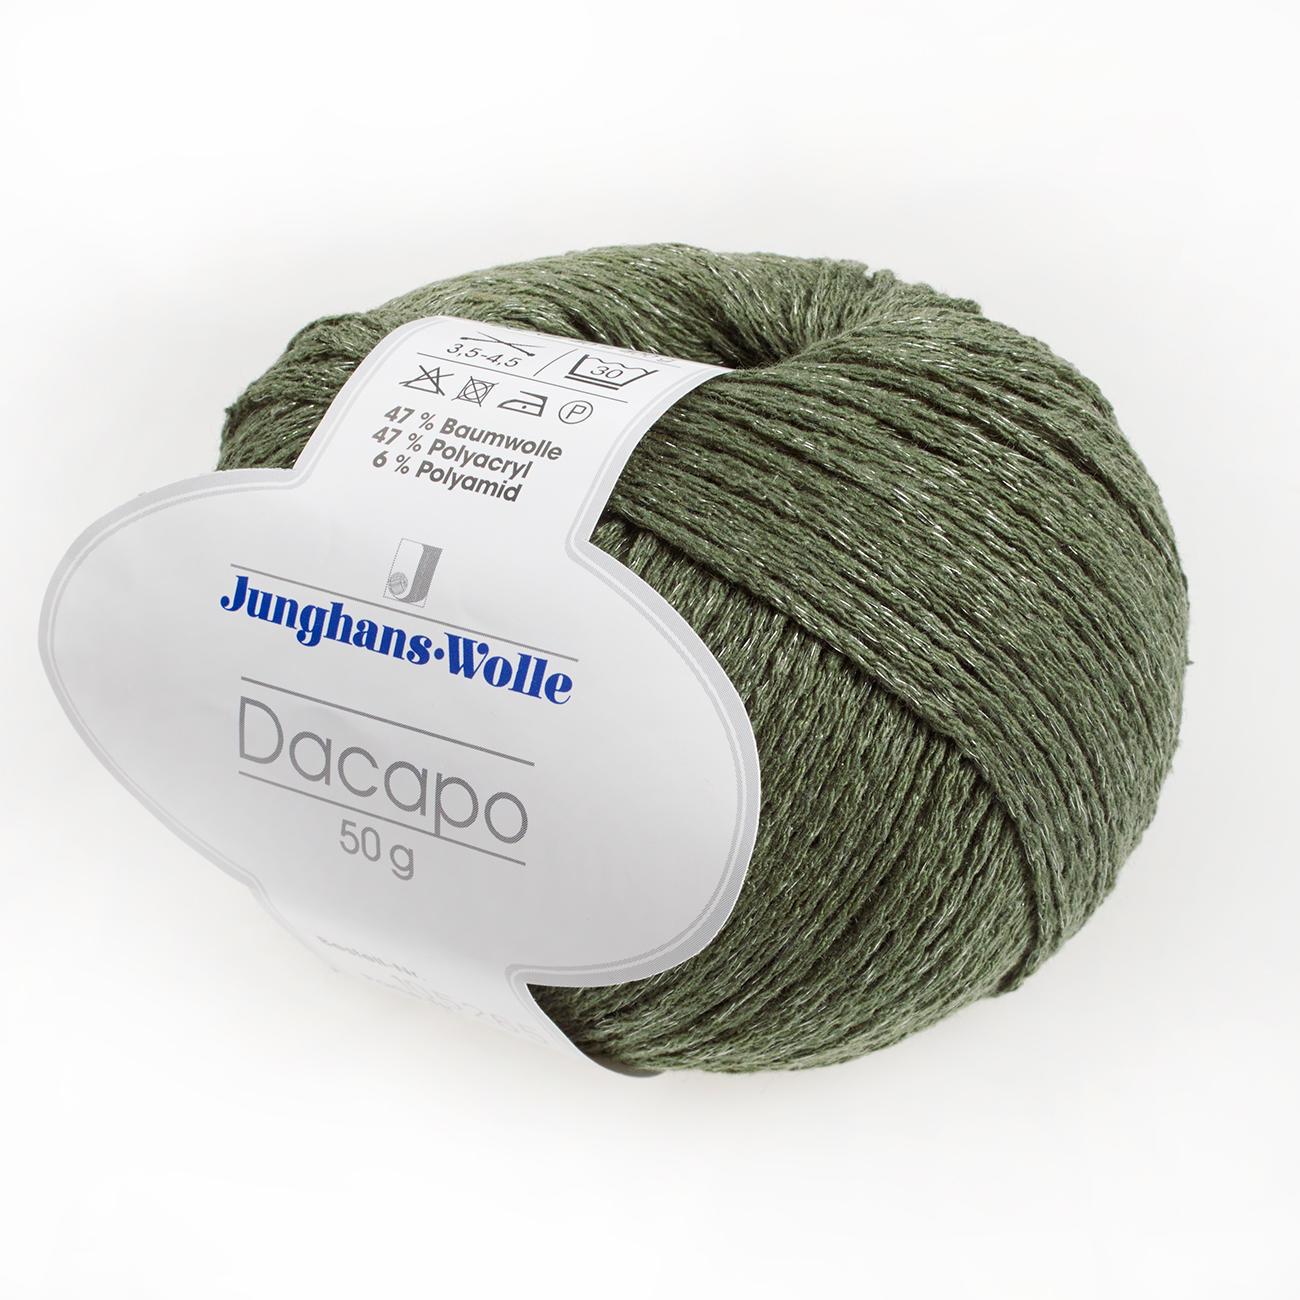 Junghans Wolle Wolle Handstrickgarne Strickanleitungen Ideen